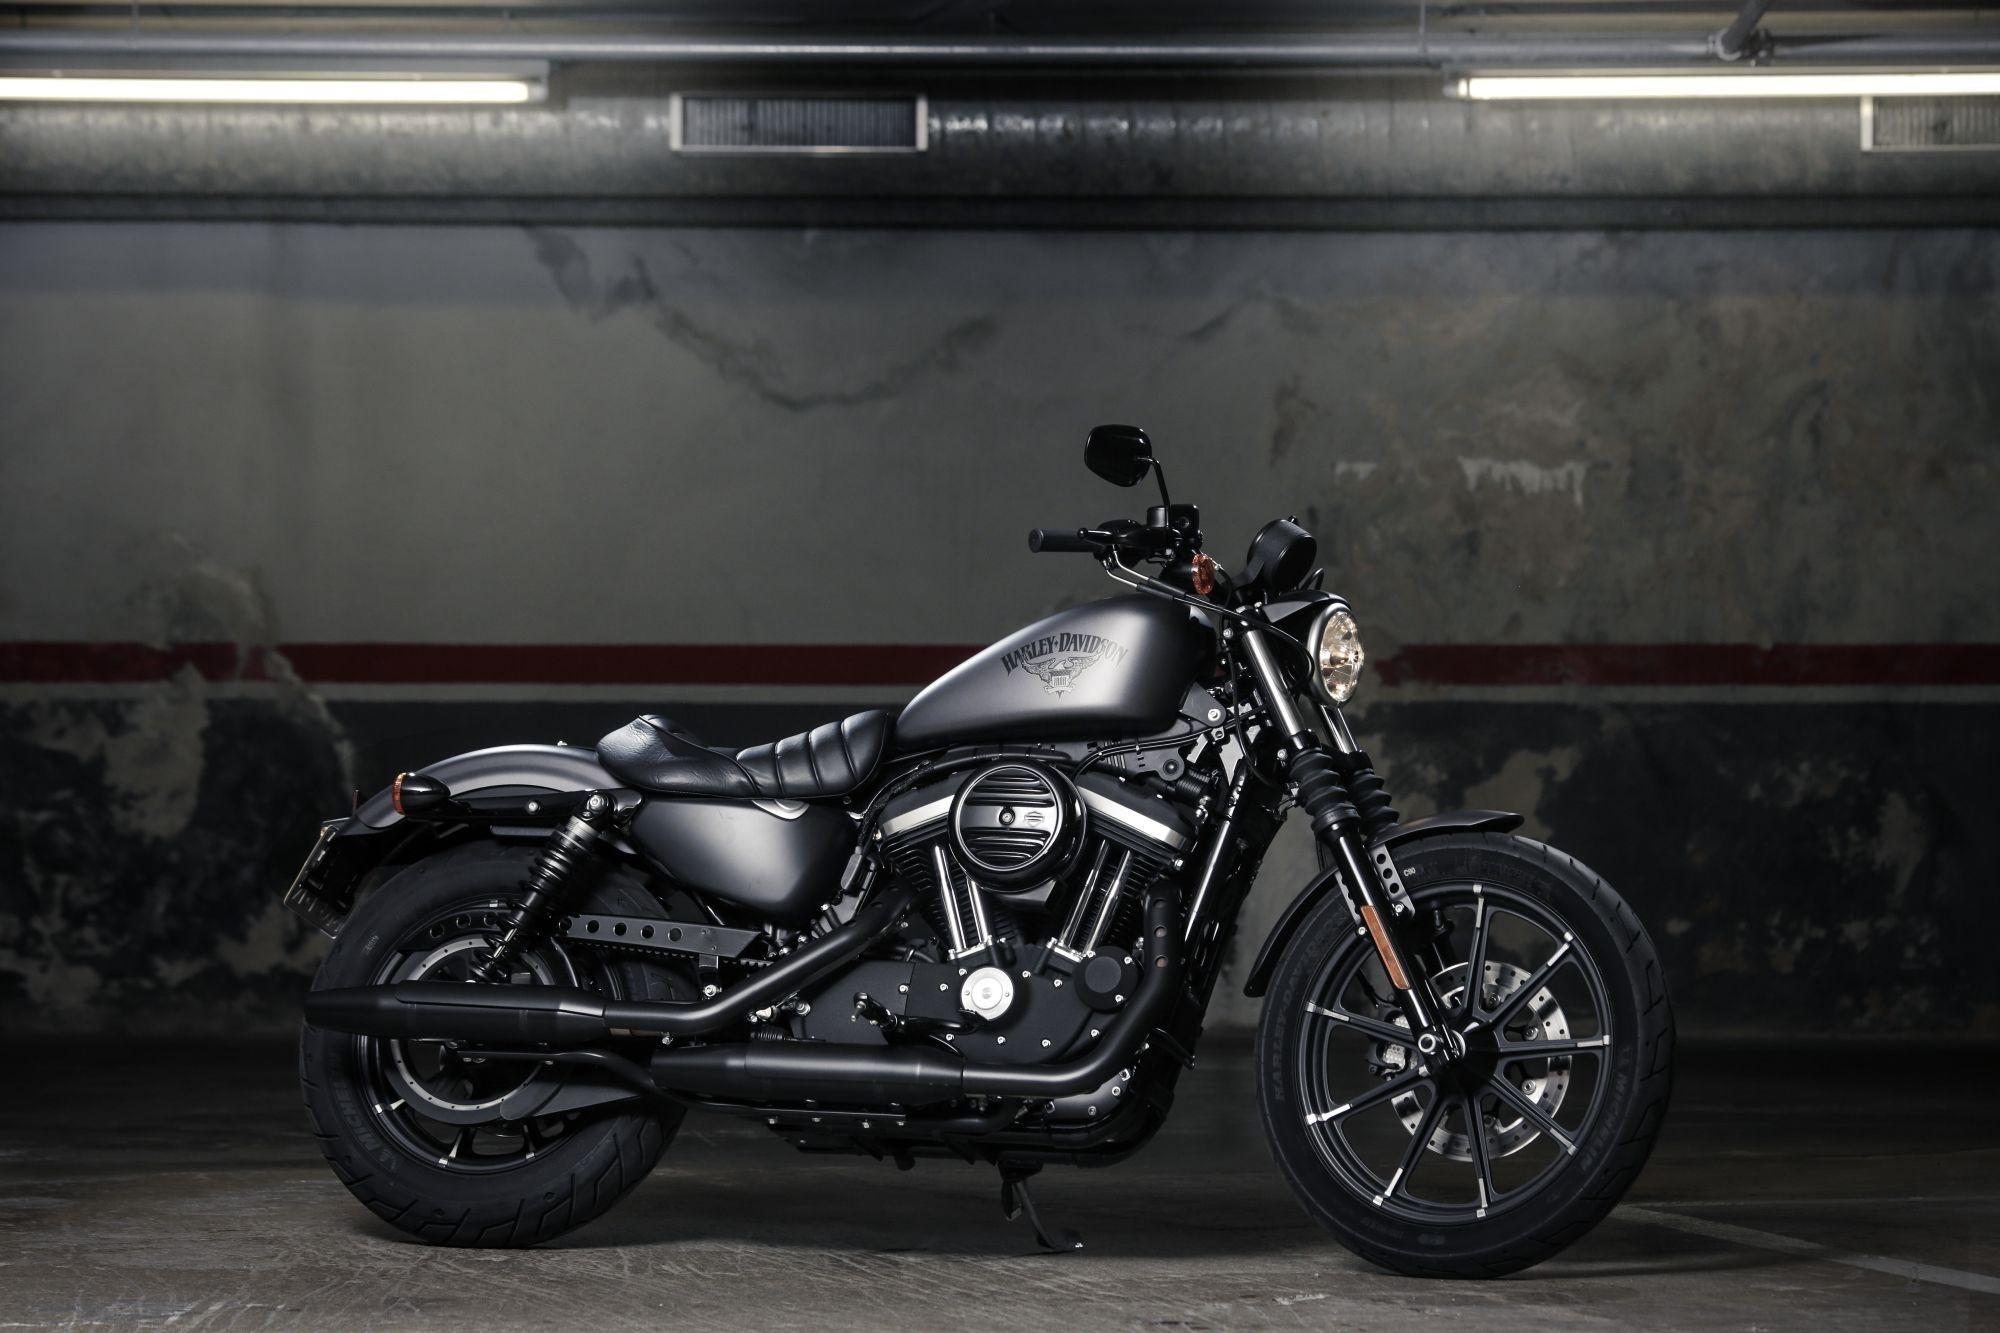 Beautiful Wallpaper High Resolution Harley Davidson - 77d0493189a74bc280444a8d6a191fd6  Picture_245889.jpg